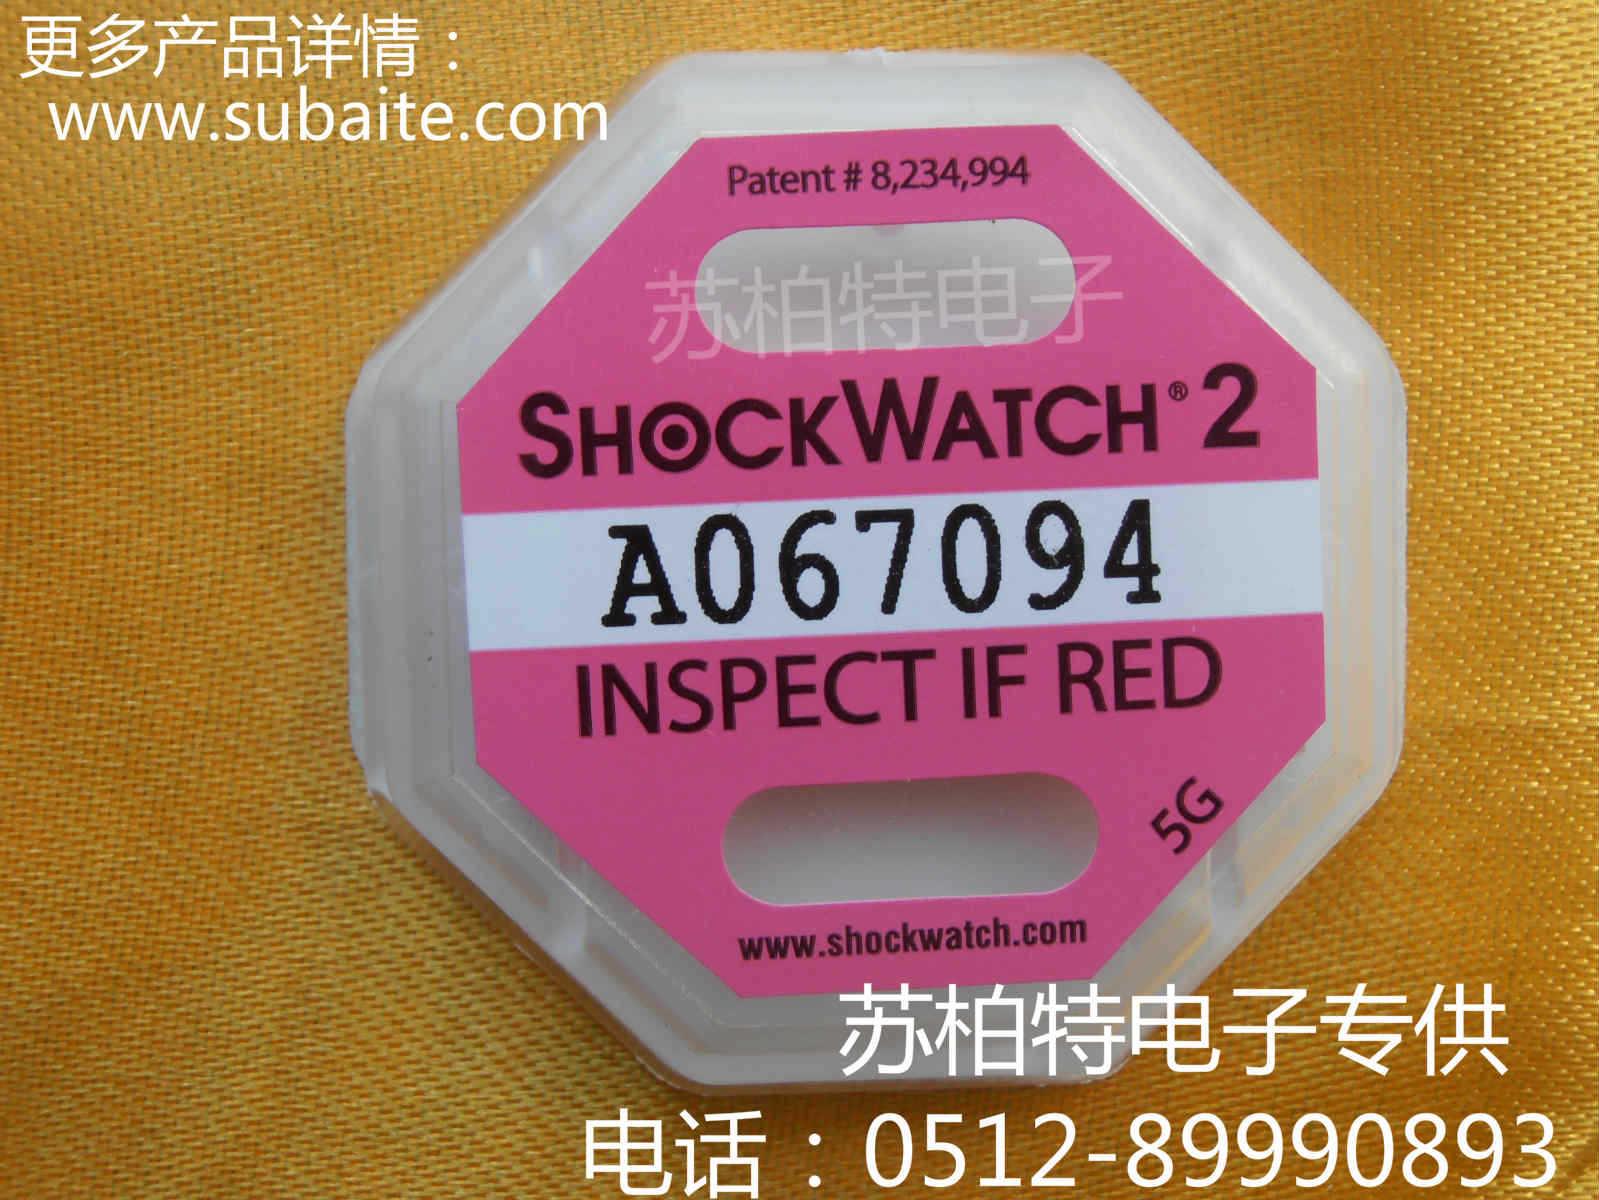 shockwatch 2-5g